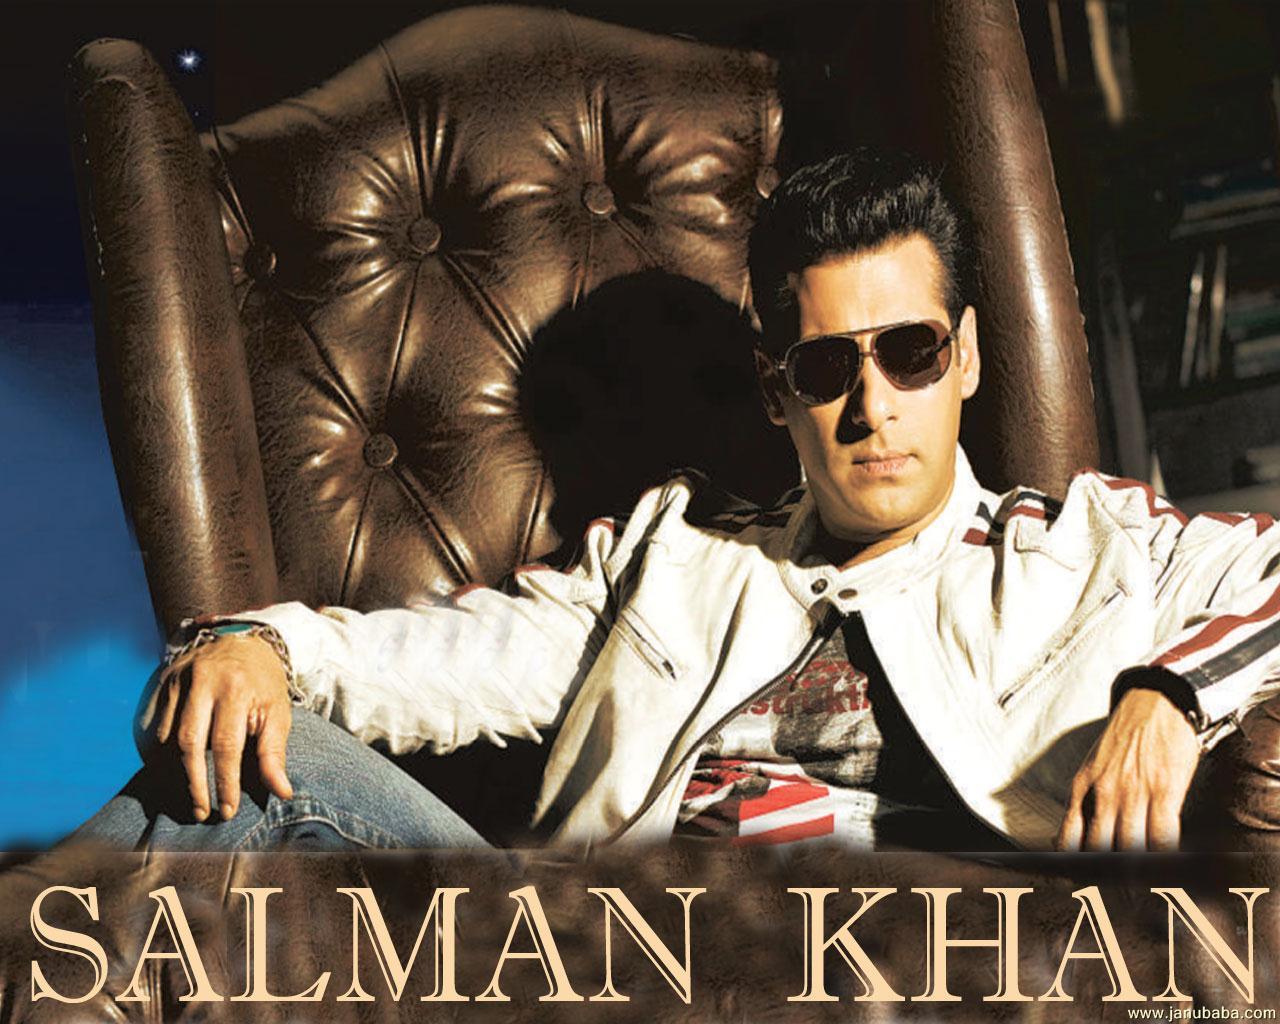 Salman Khan All Images Free Download Vinnyoleo Vegetalinfo